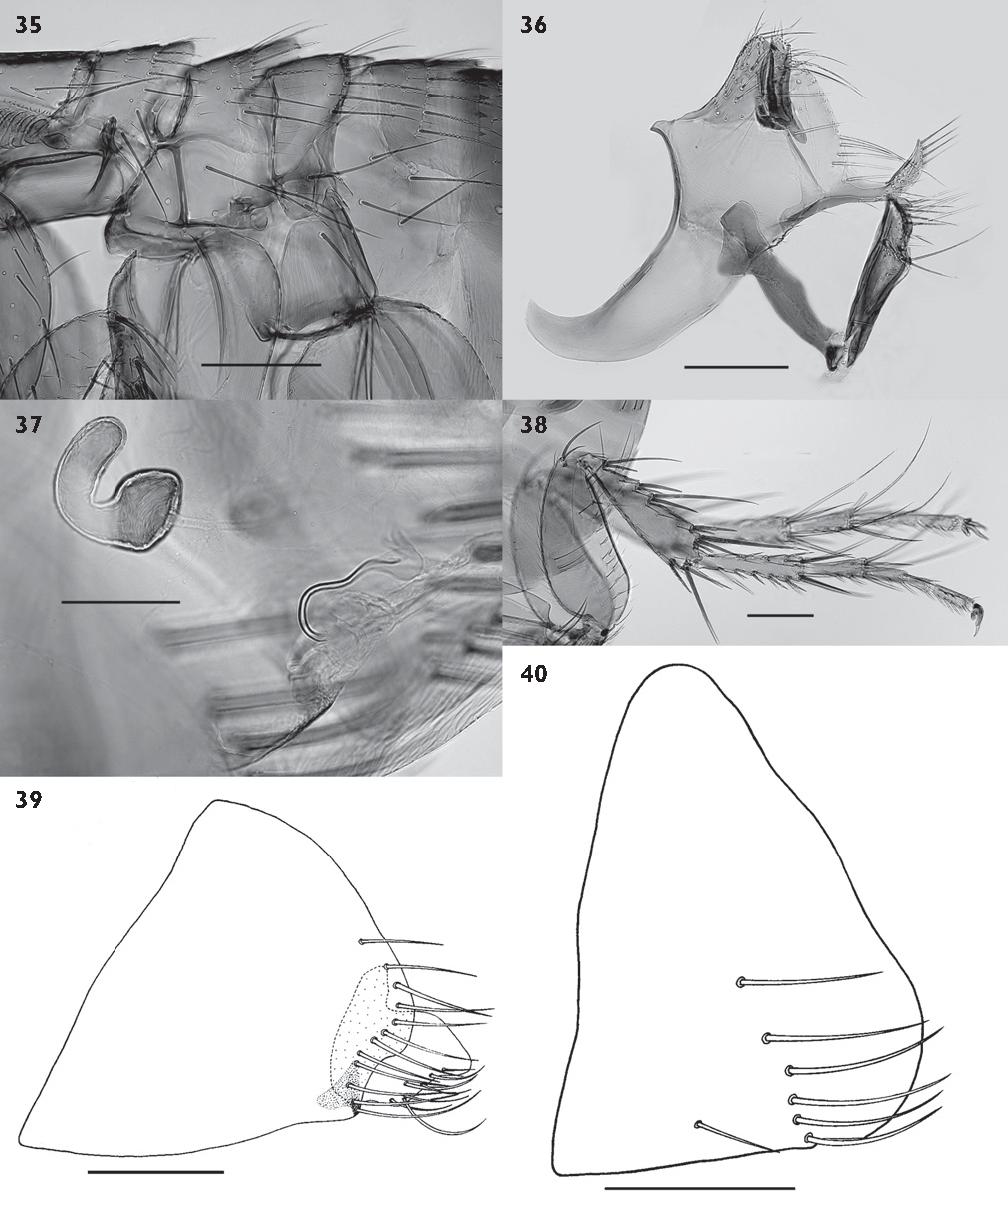 figure 35-40